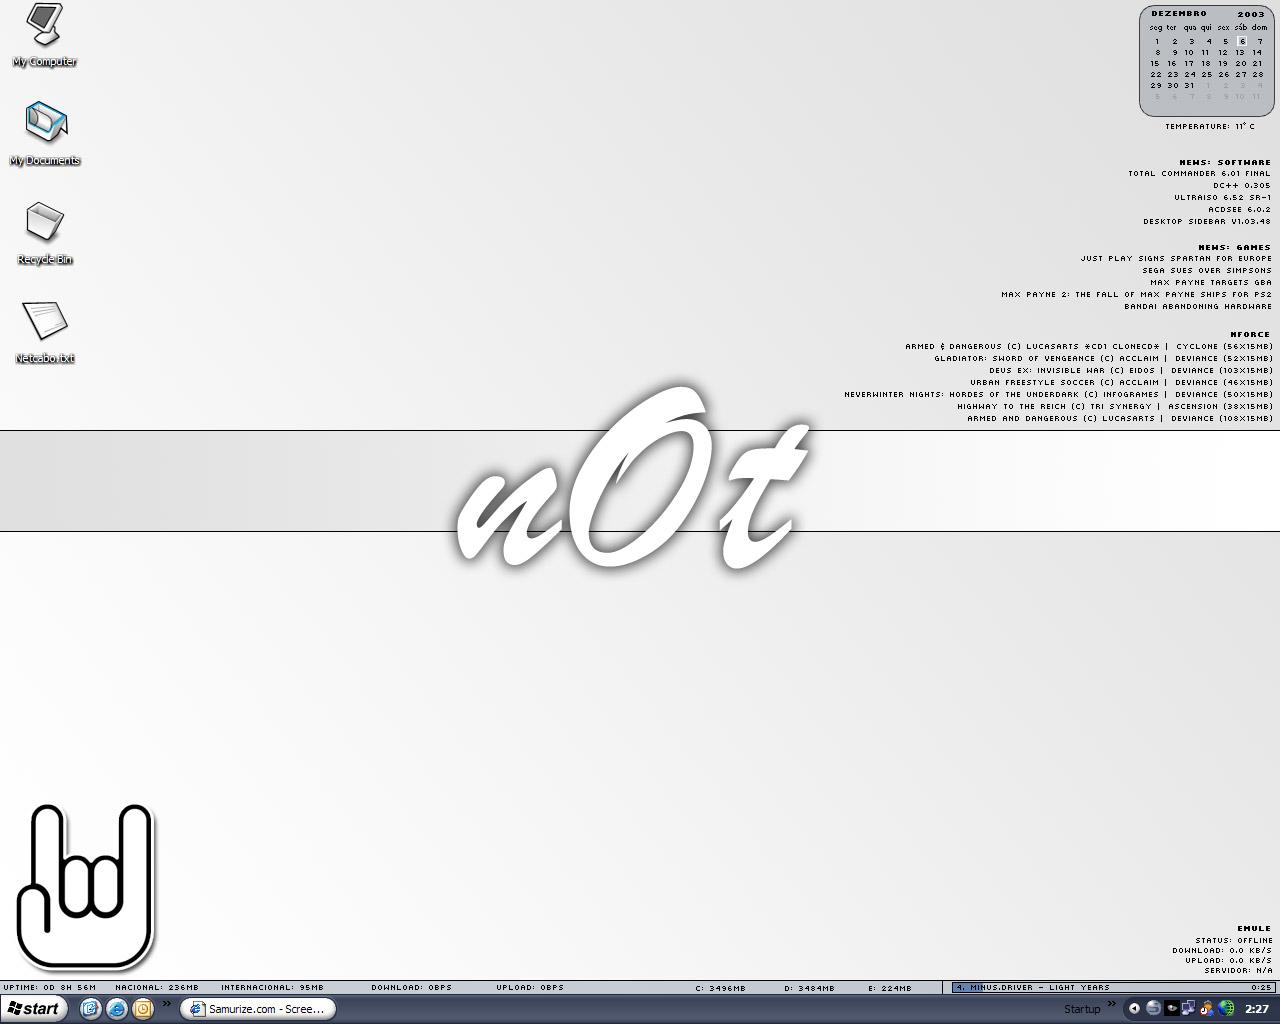 Title: // nOt Desktop //